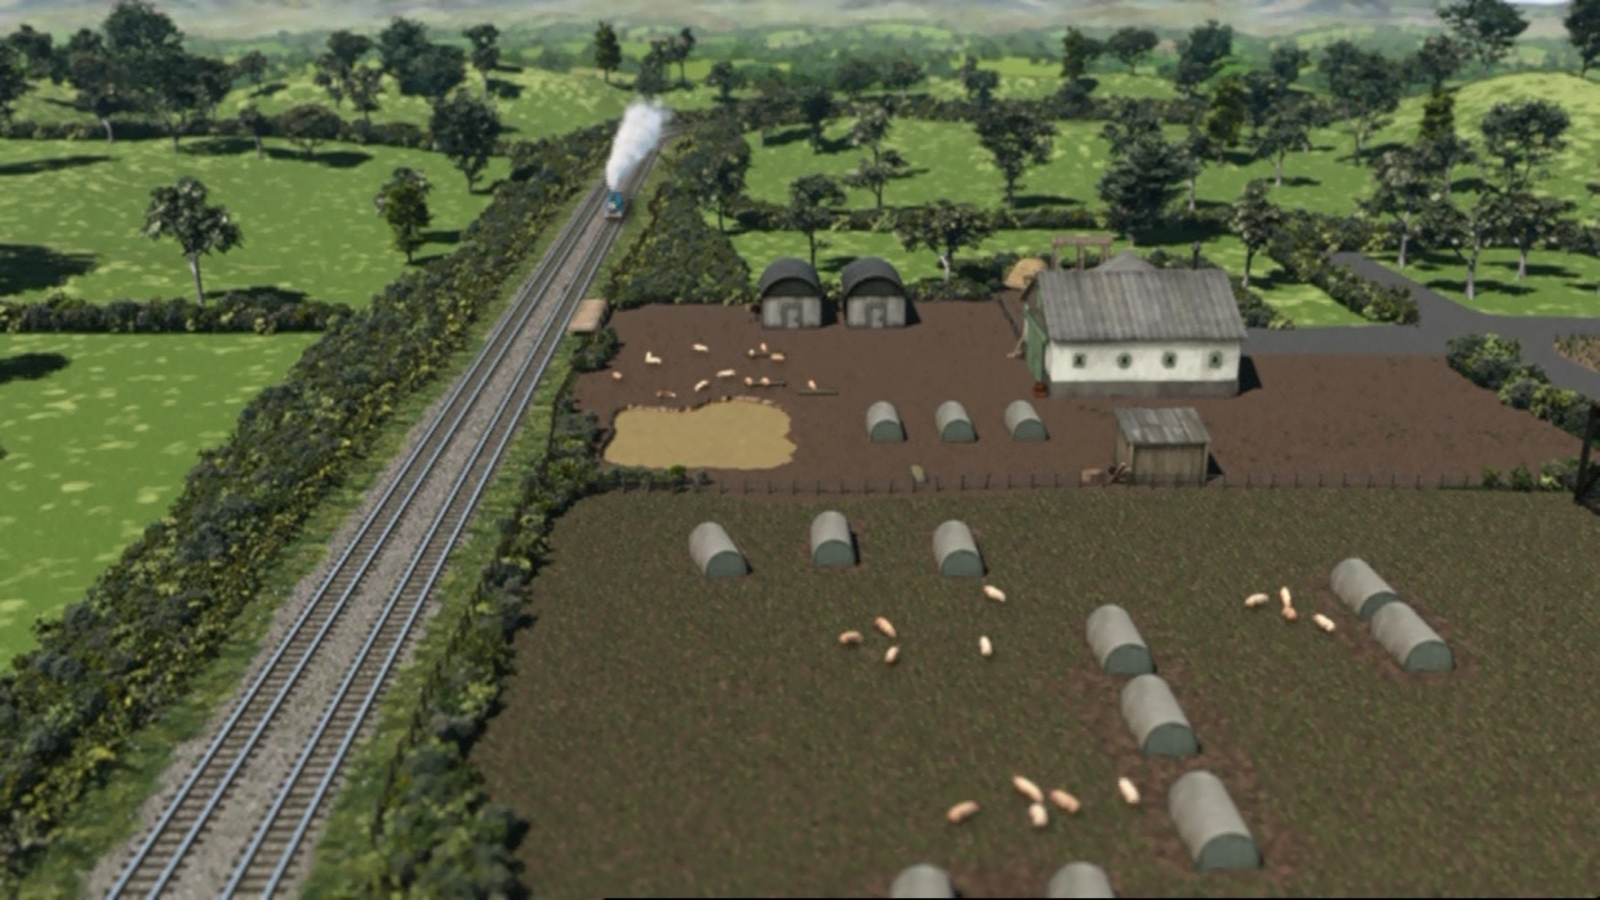 Farmer Trotter's Pig Farm